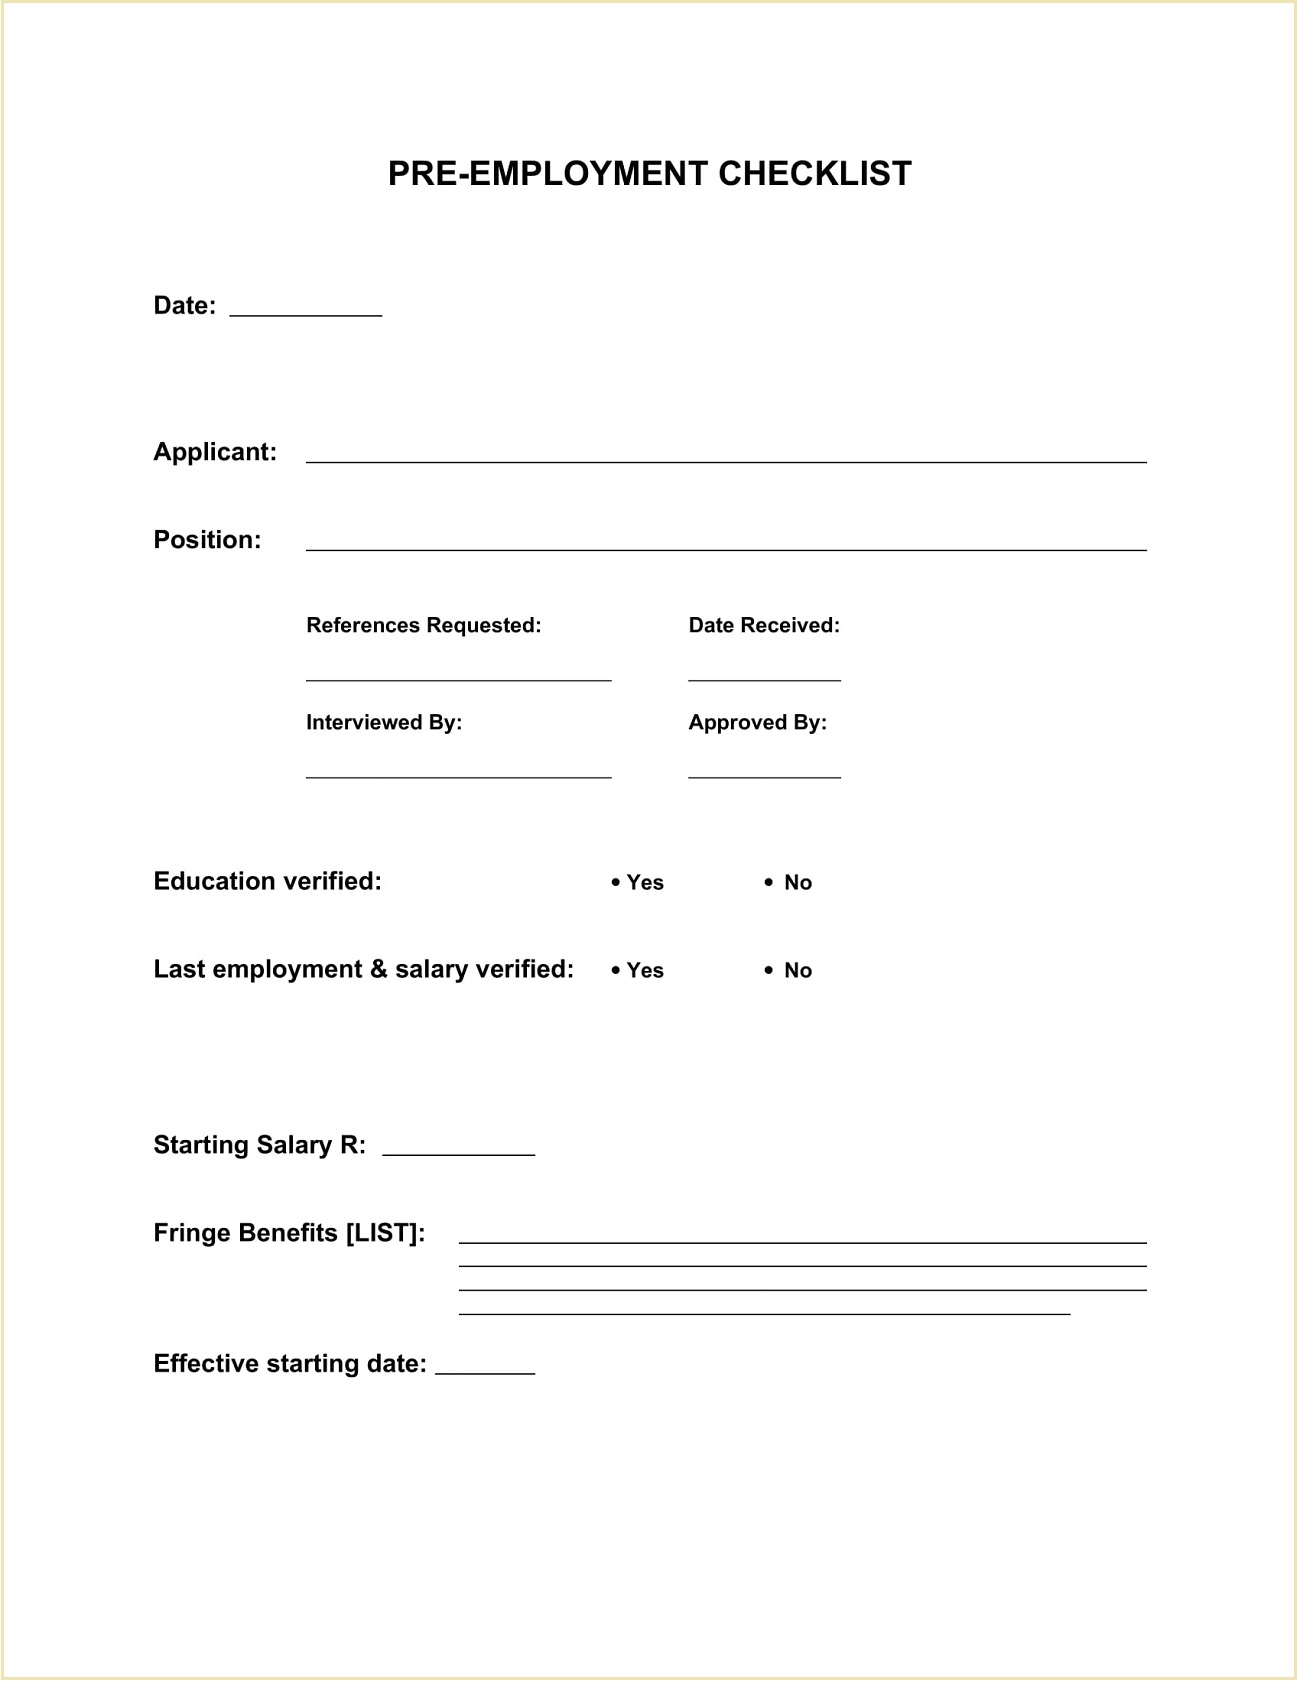 Simple Pre-Employment Checklist Word Template